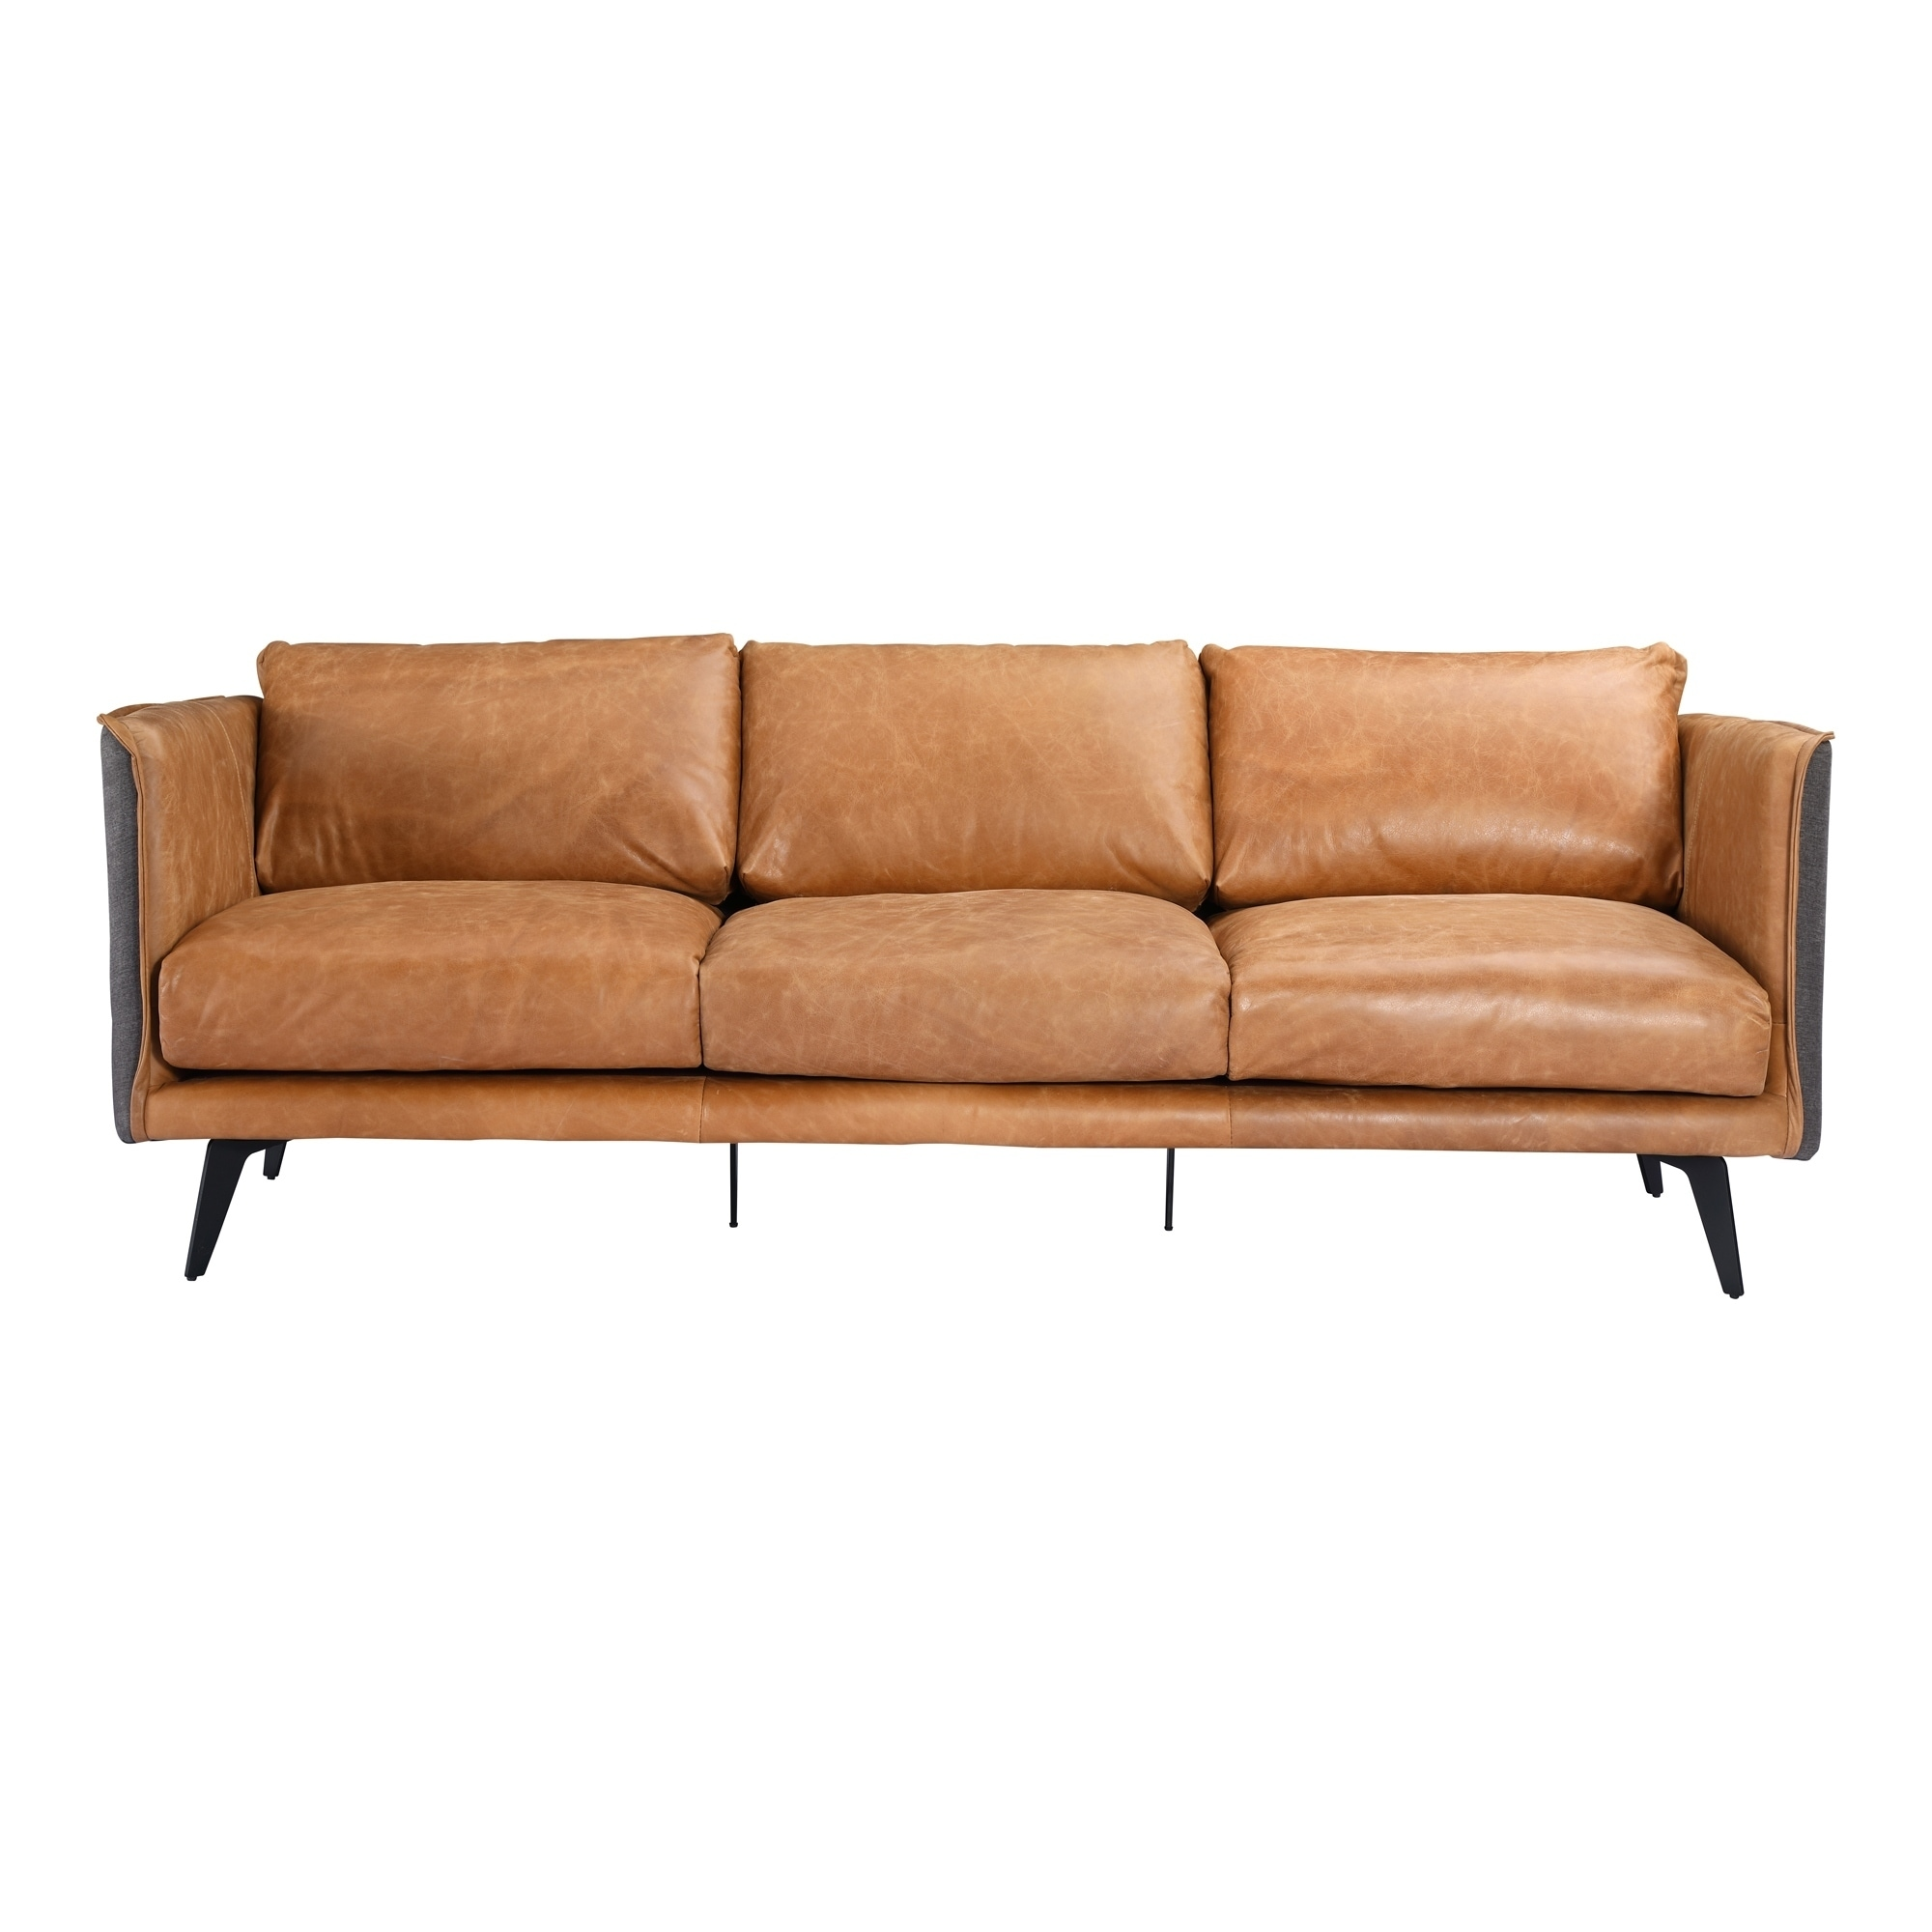 Aurelle Home Mid-century Modern Cognac Leather Sofa